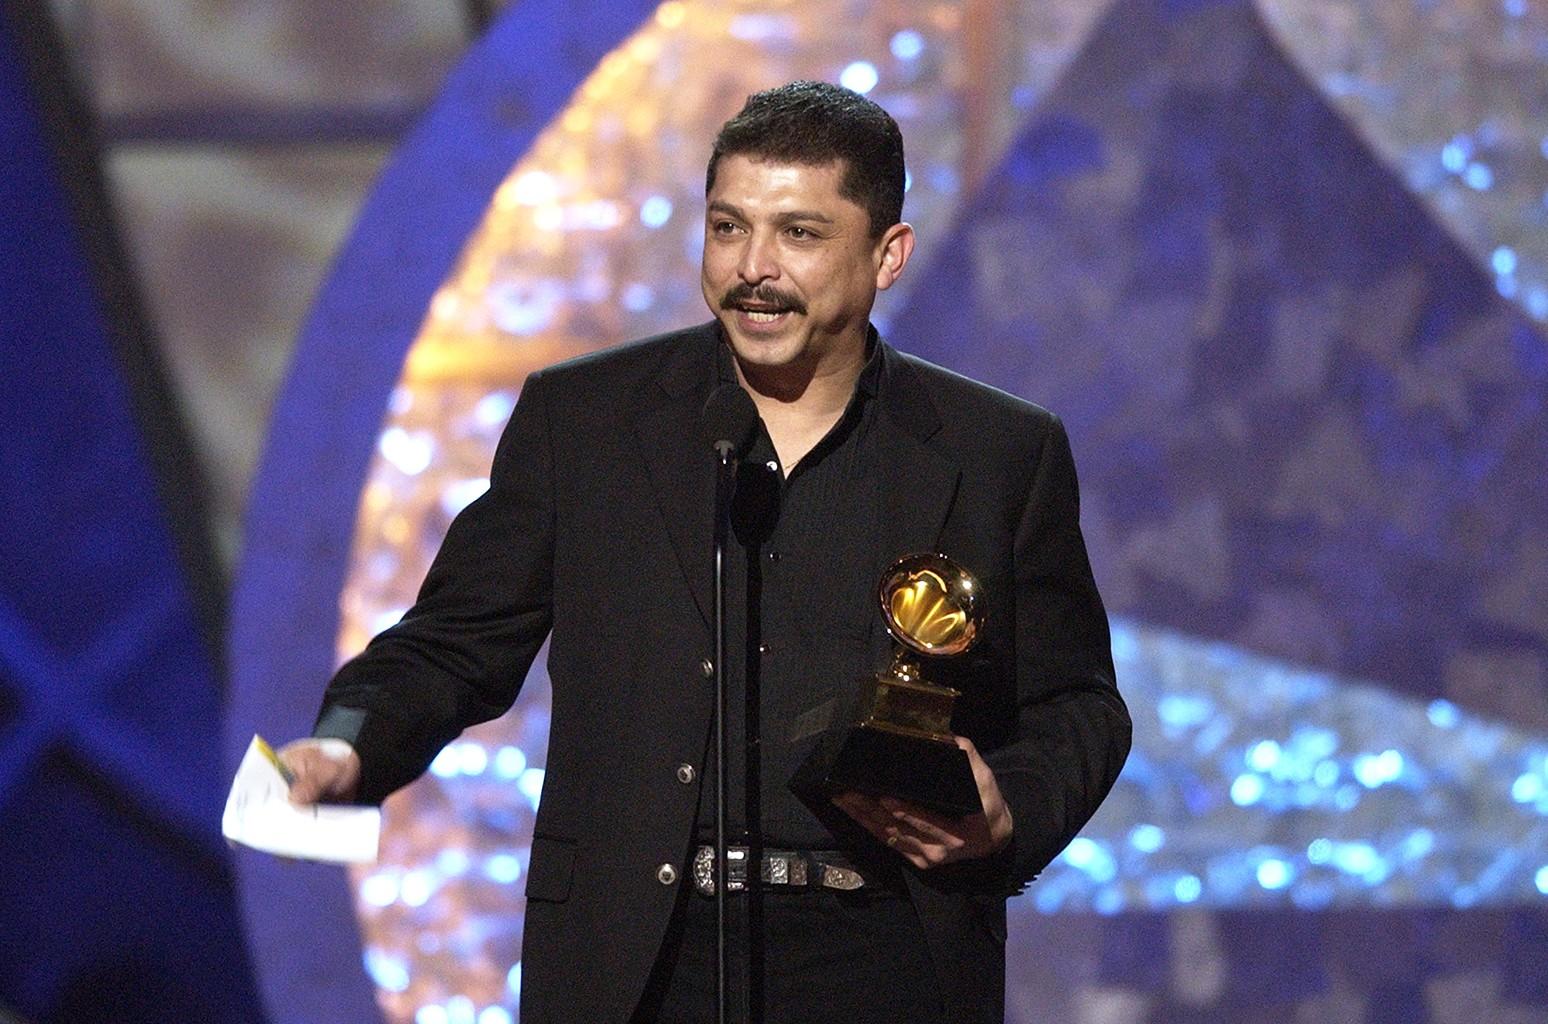 Emilio Navaira at the 45th Annual Grammy Awards